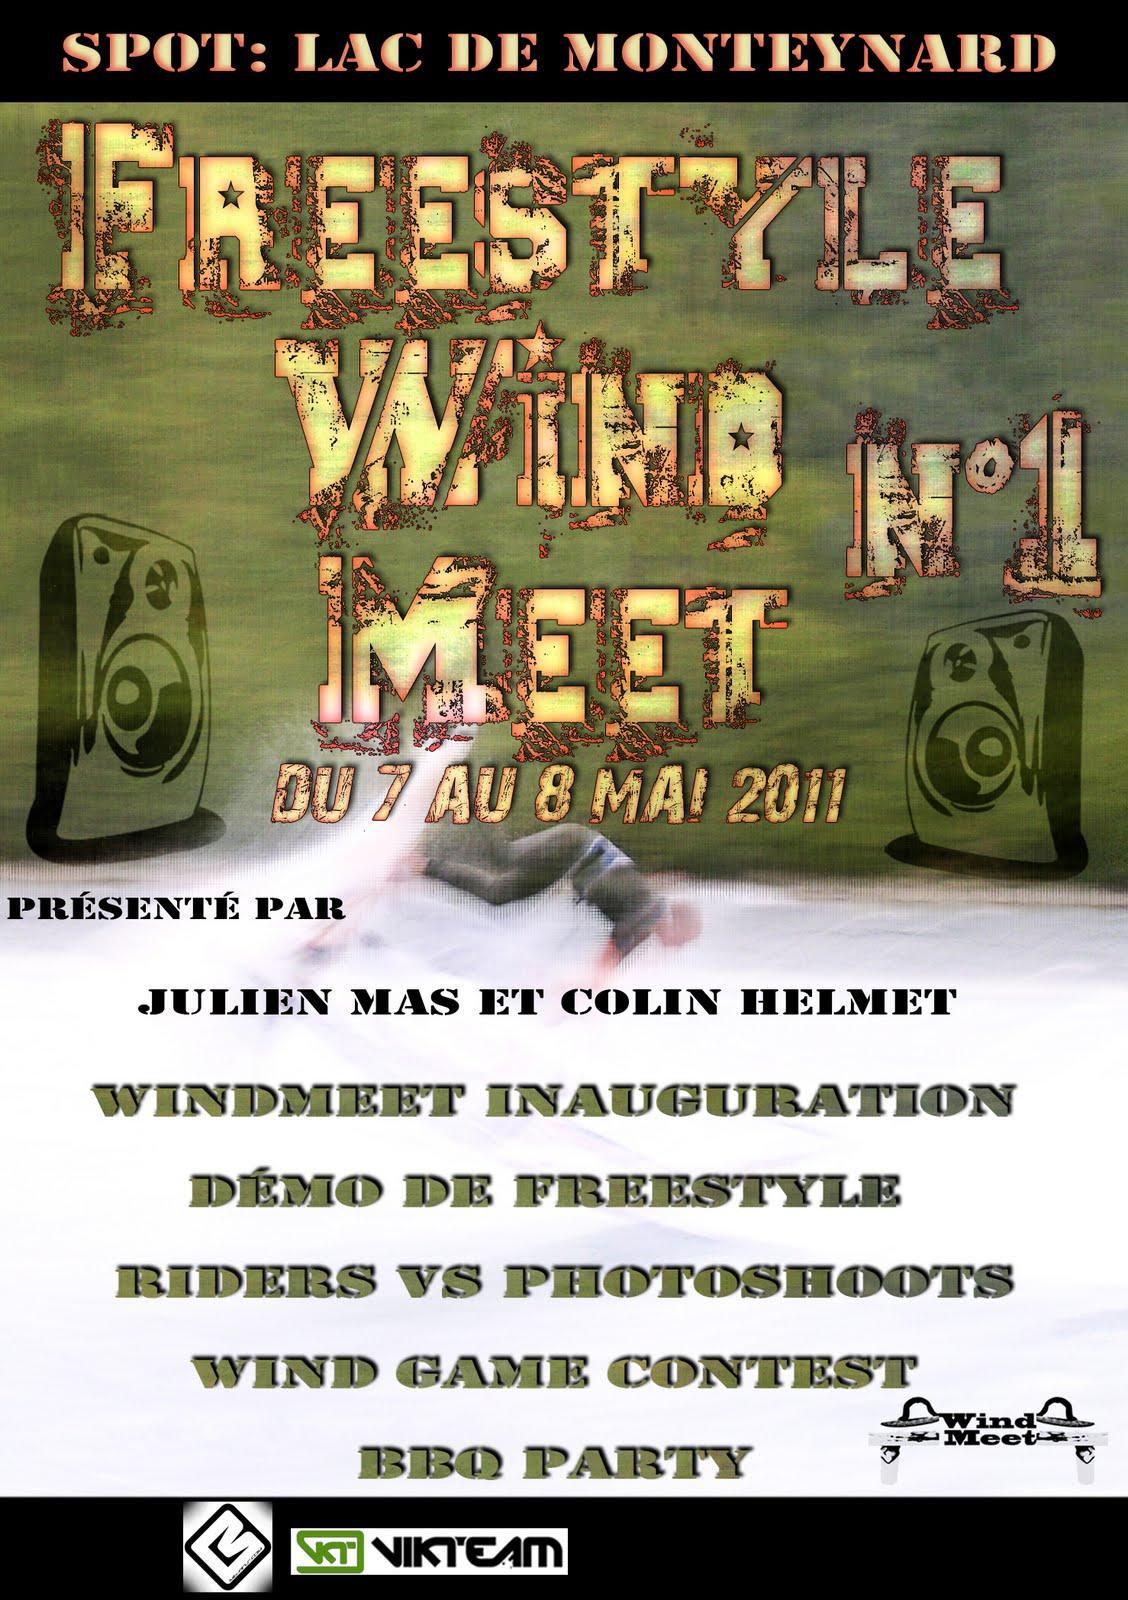 http://1.bp.blogspot.com/-VjF-eRCPv6Q/TbPsHvmsn8I/AAAAAAAAAgA/F9AIGkant7k/s1600/fly+wind+meed.jpg